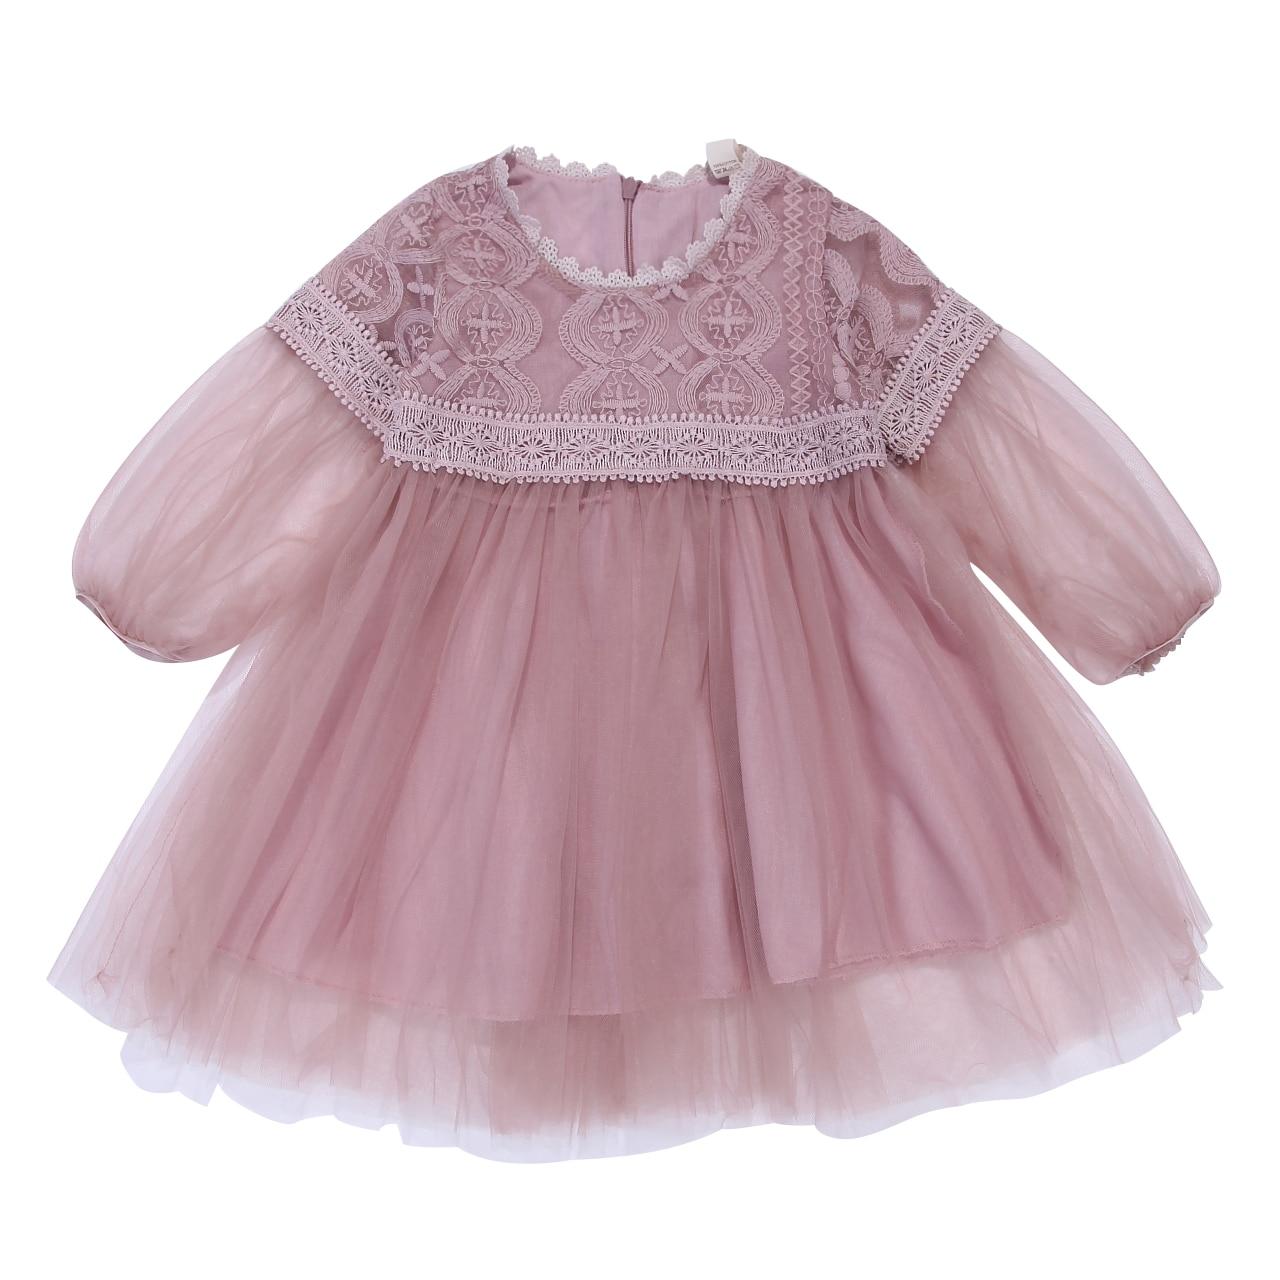 Newborn Toddler Baby Girls Mesh Dress Long Sleeve Autumn Floral Princess Dresses Lace Pageant Party Wedding Tutu Clothes Vestido